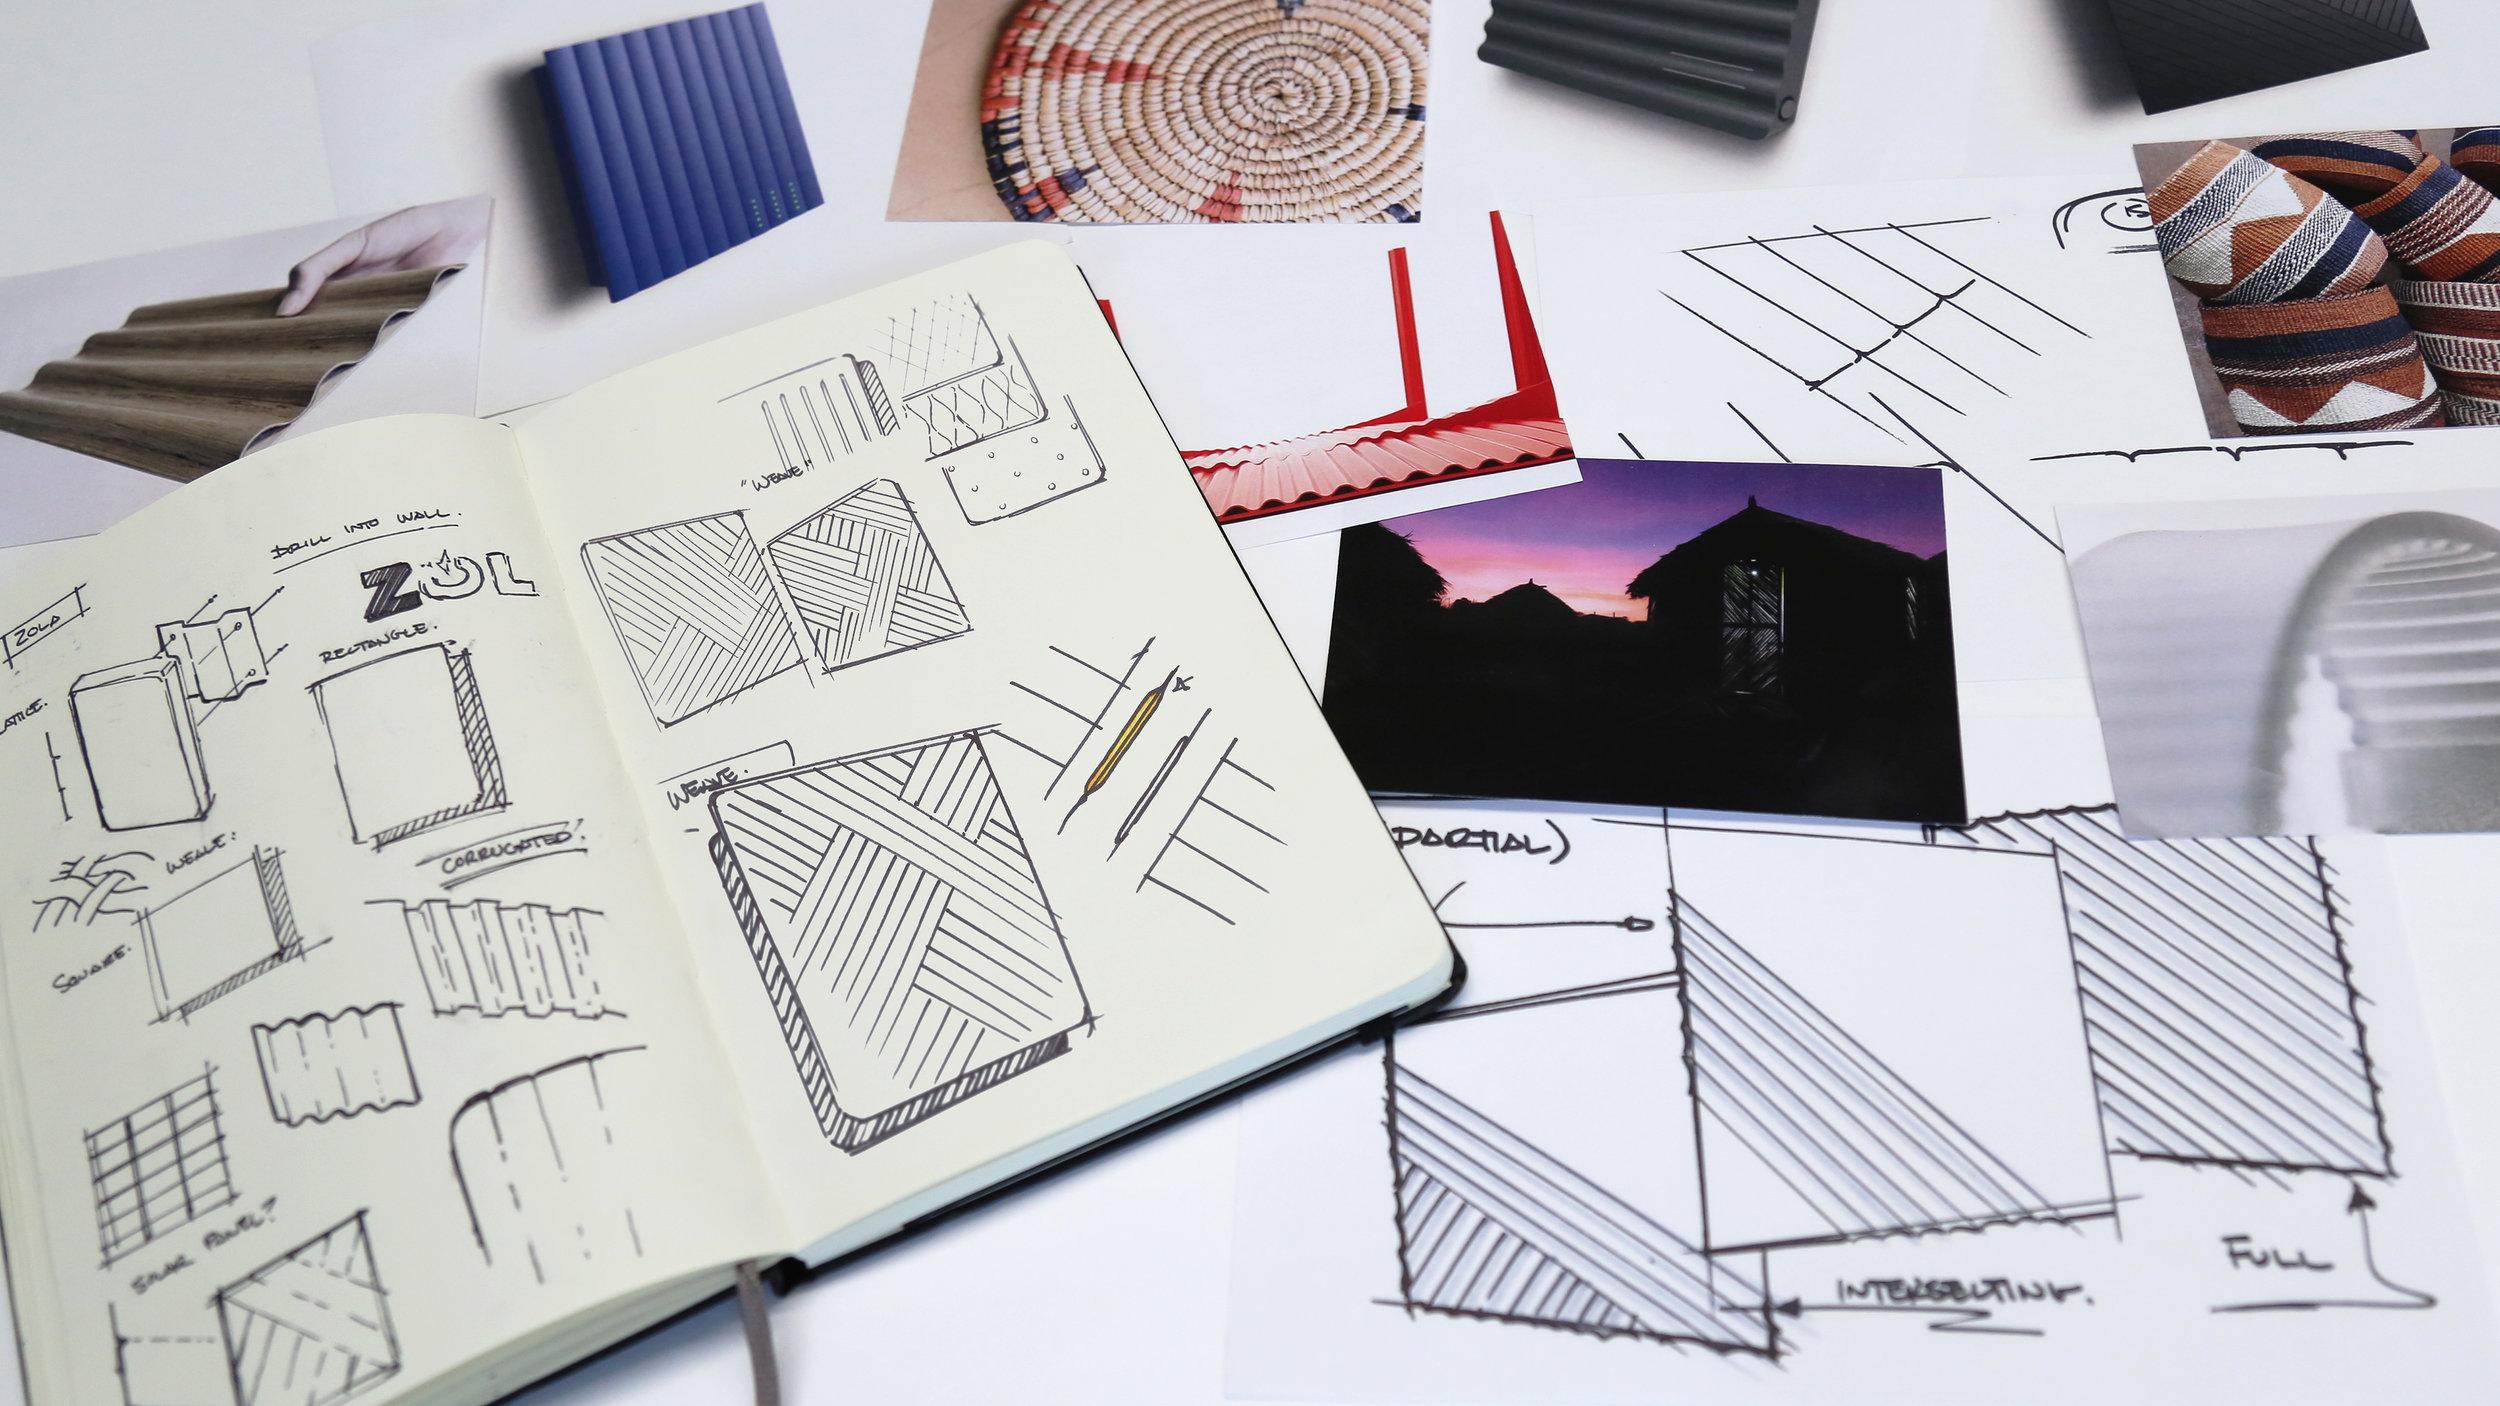 Zola electric sketches